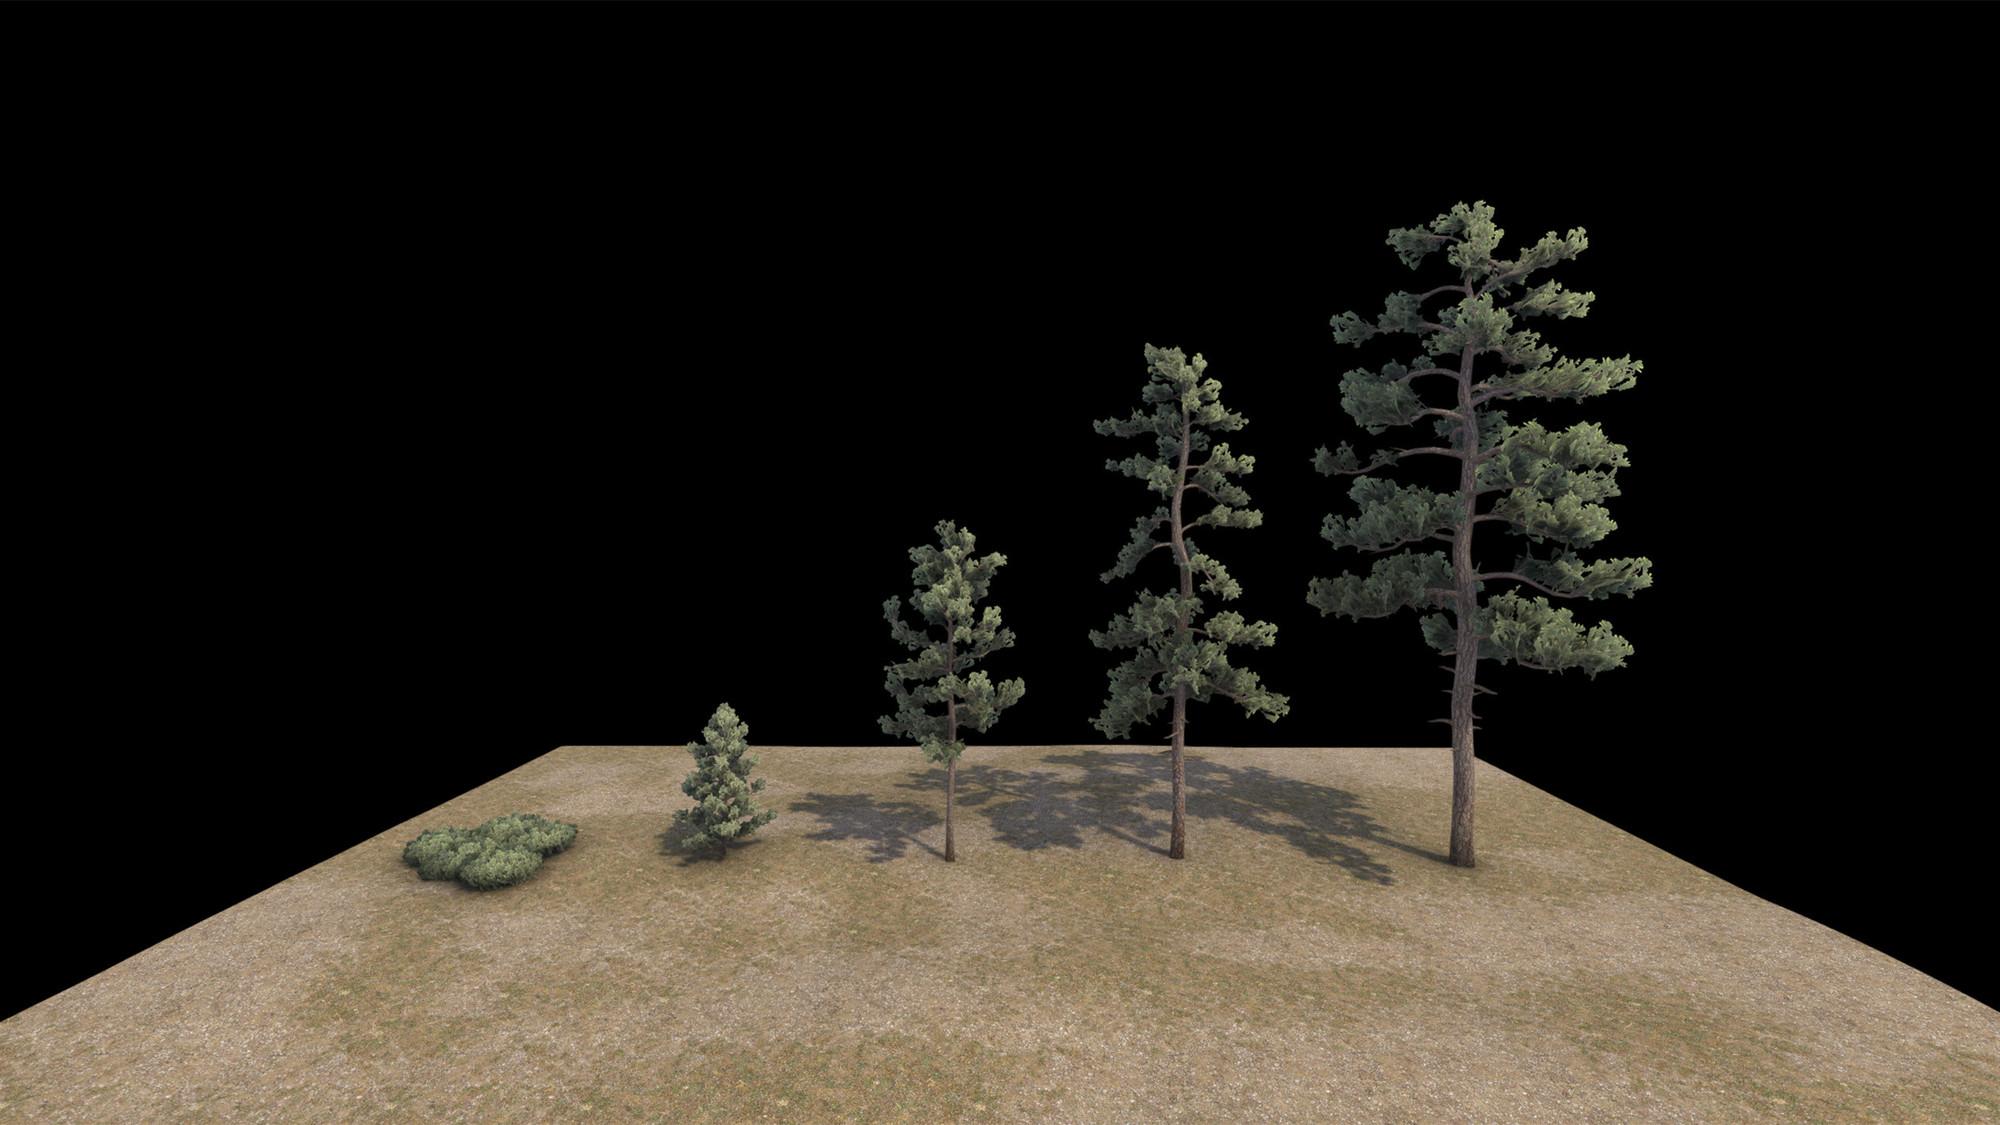 pine_family.thumb.jpg.8b4190d4df8f324c18a6c350f64300e1.jpg